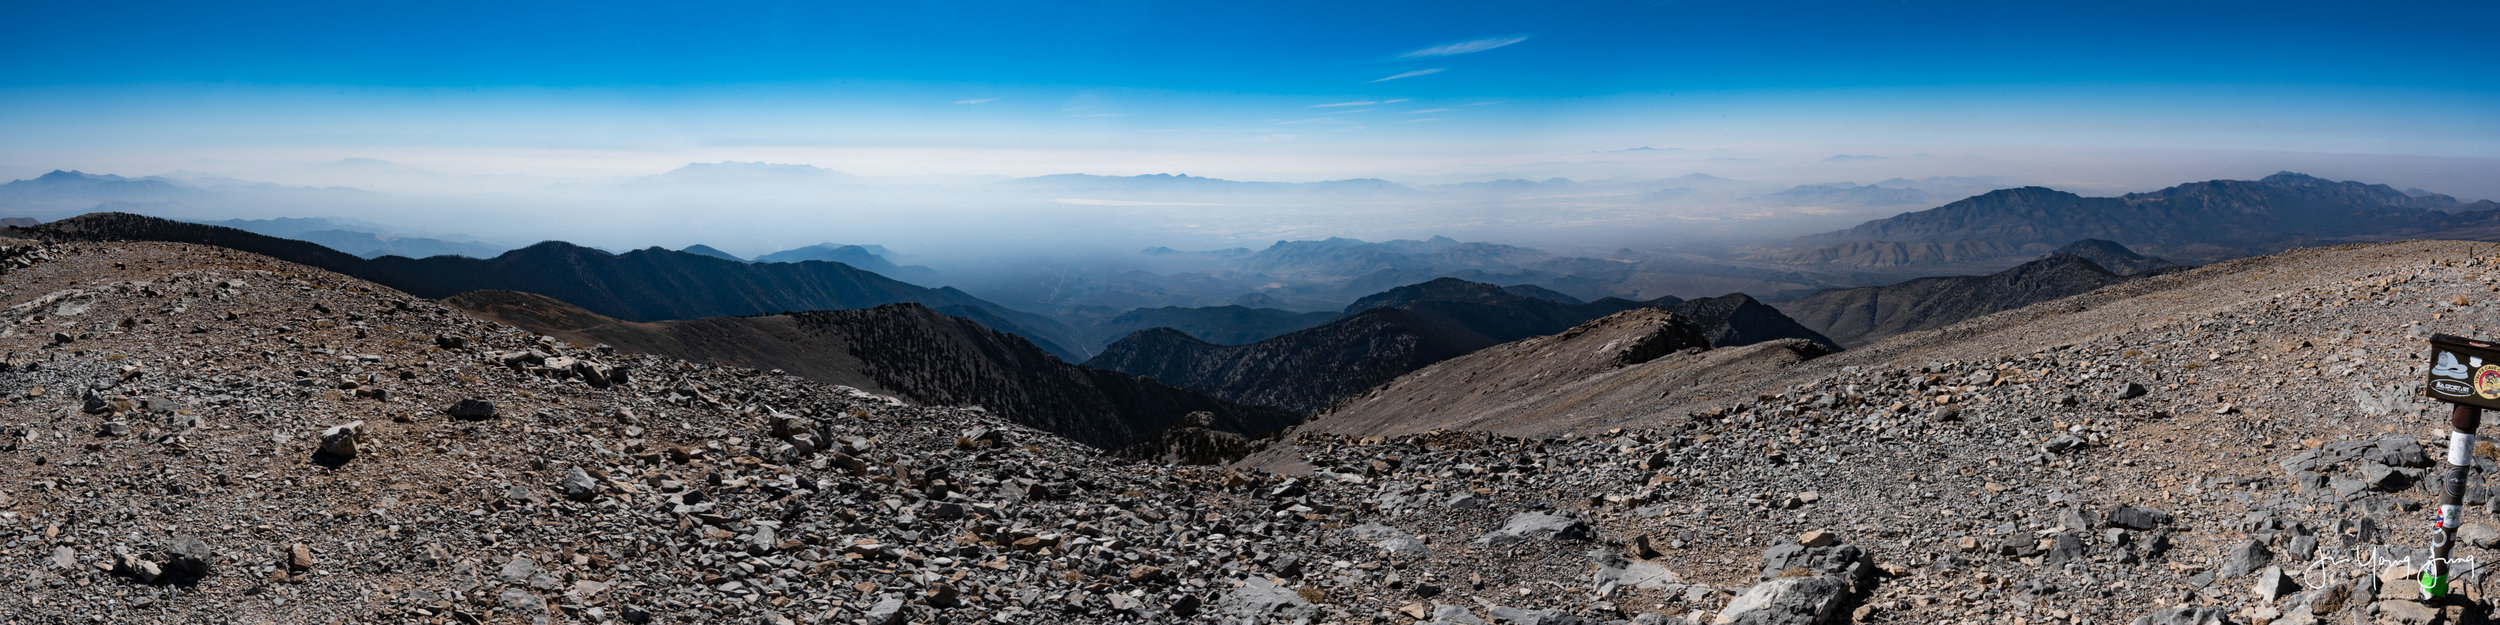 West View from Mt. Charleston Peak